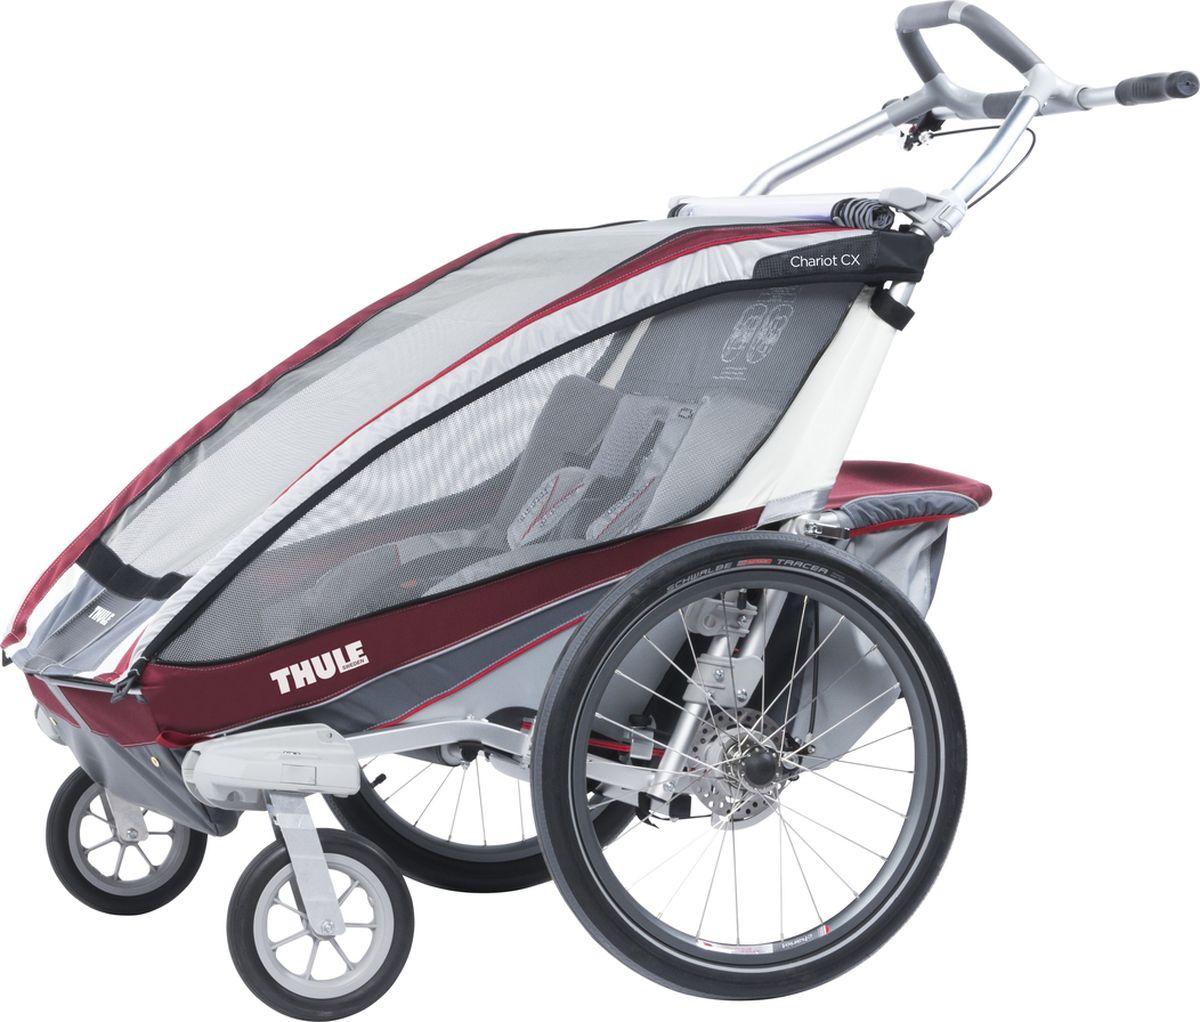 Thule Коляска-трансформер Chariot CX 2 цвет бордовый  коляска thule chariot cx2 бордовый